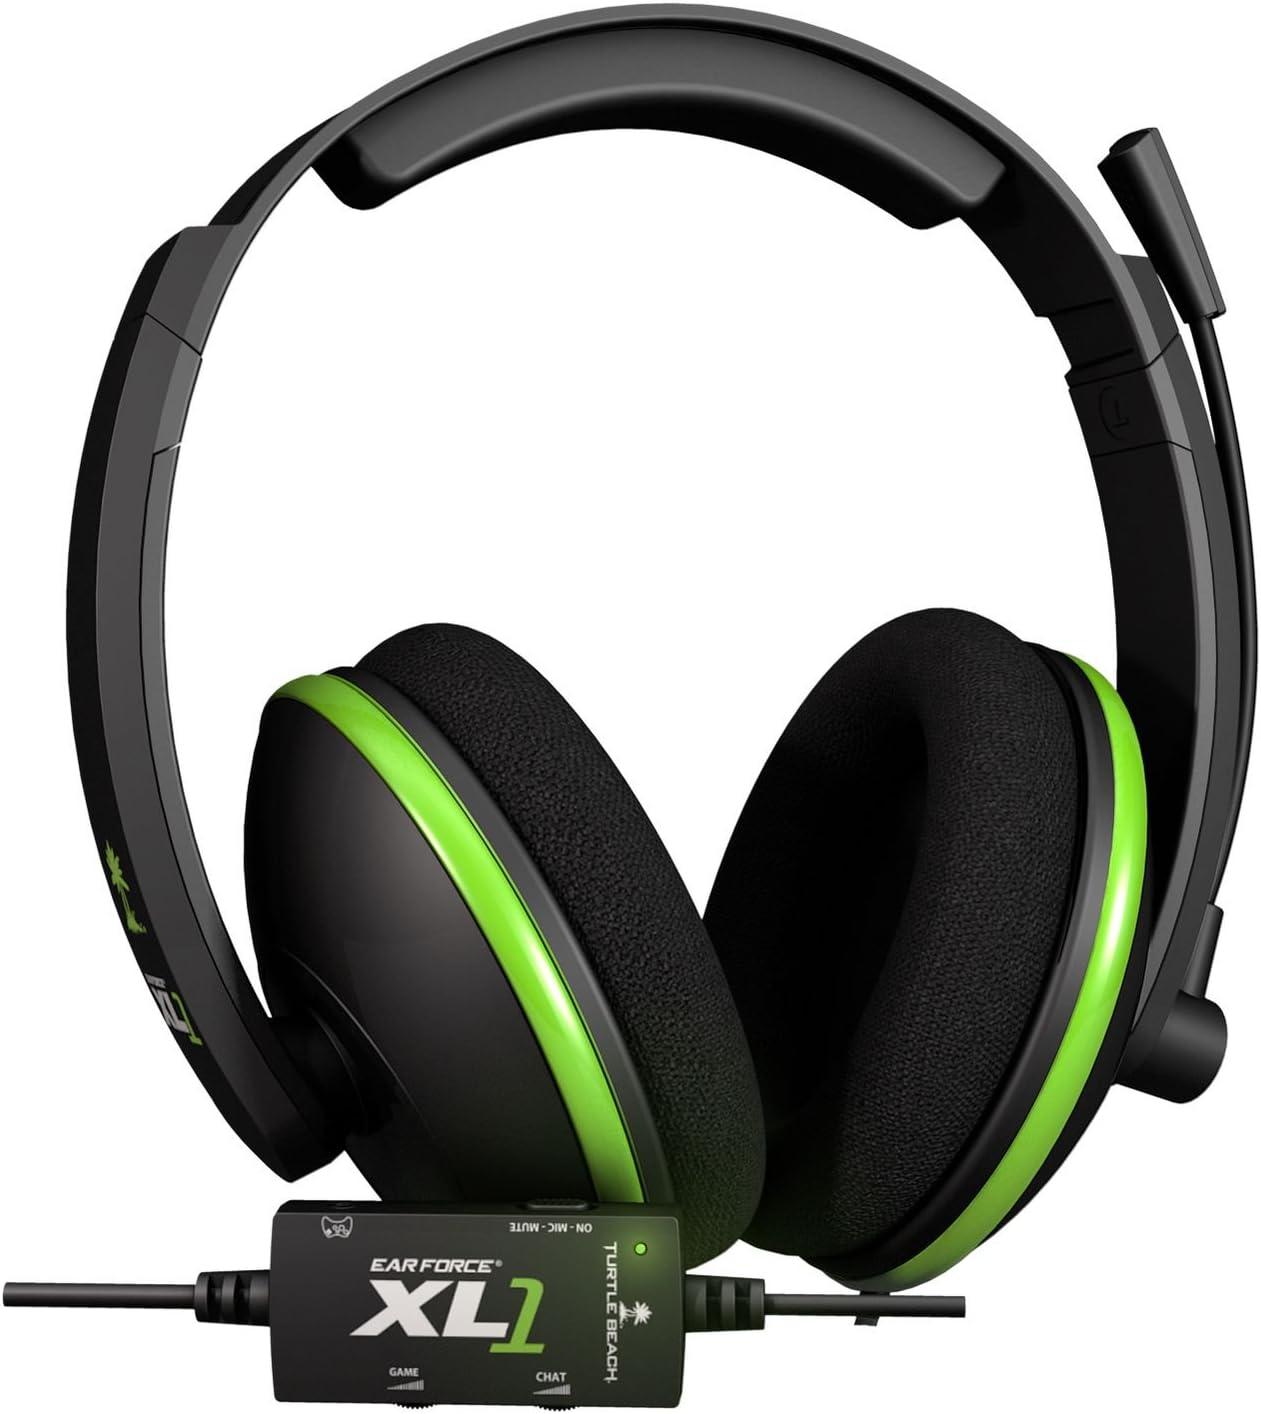 dd157ec08a3 Amazon.com: Turtle Beach - Ear Force XL1 Gaming Headset - Amplified ...